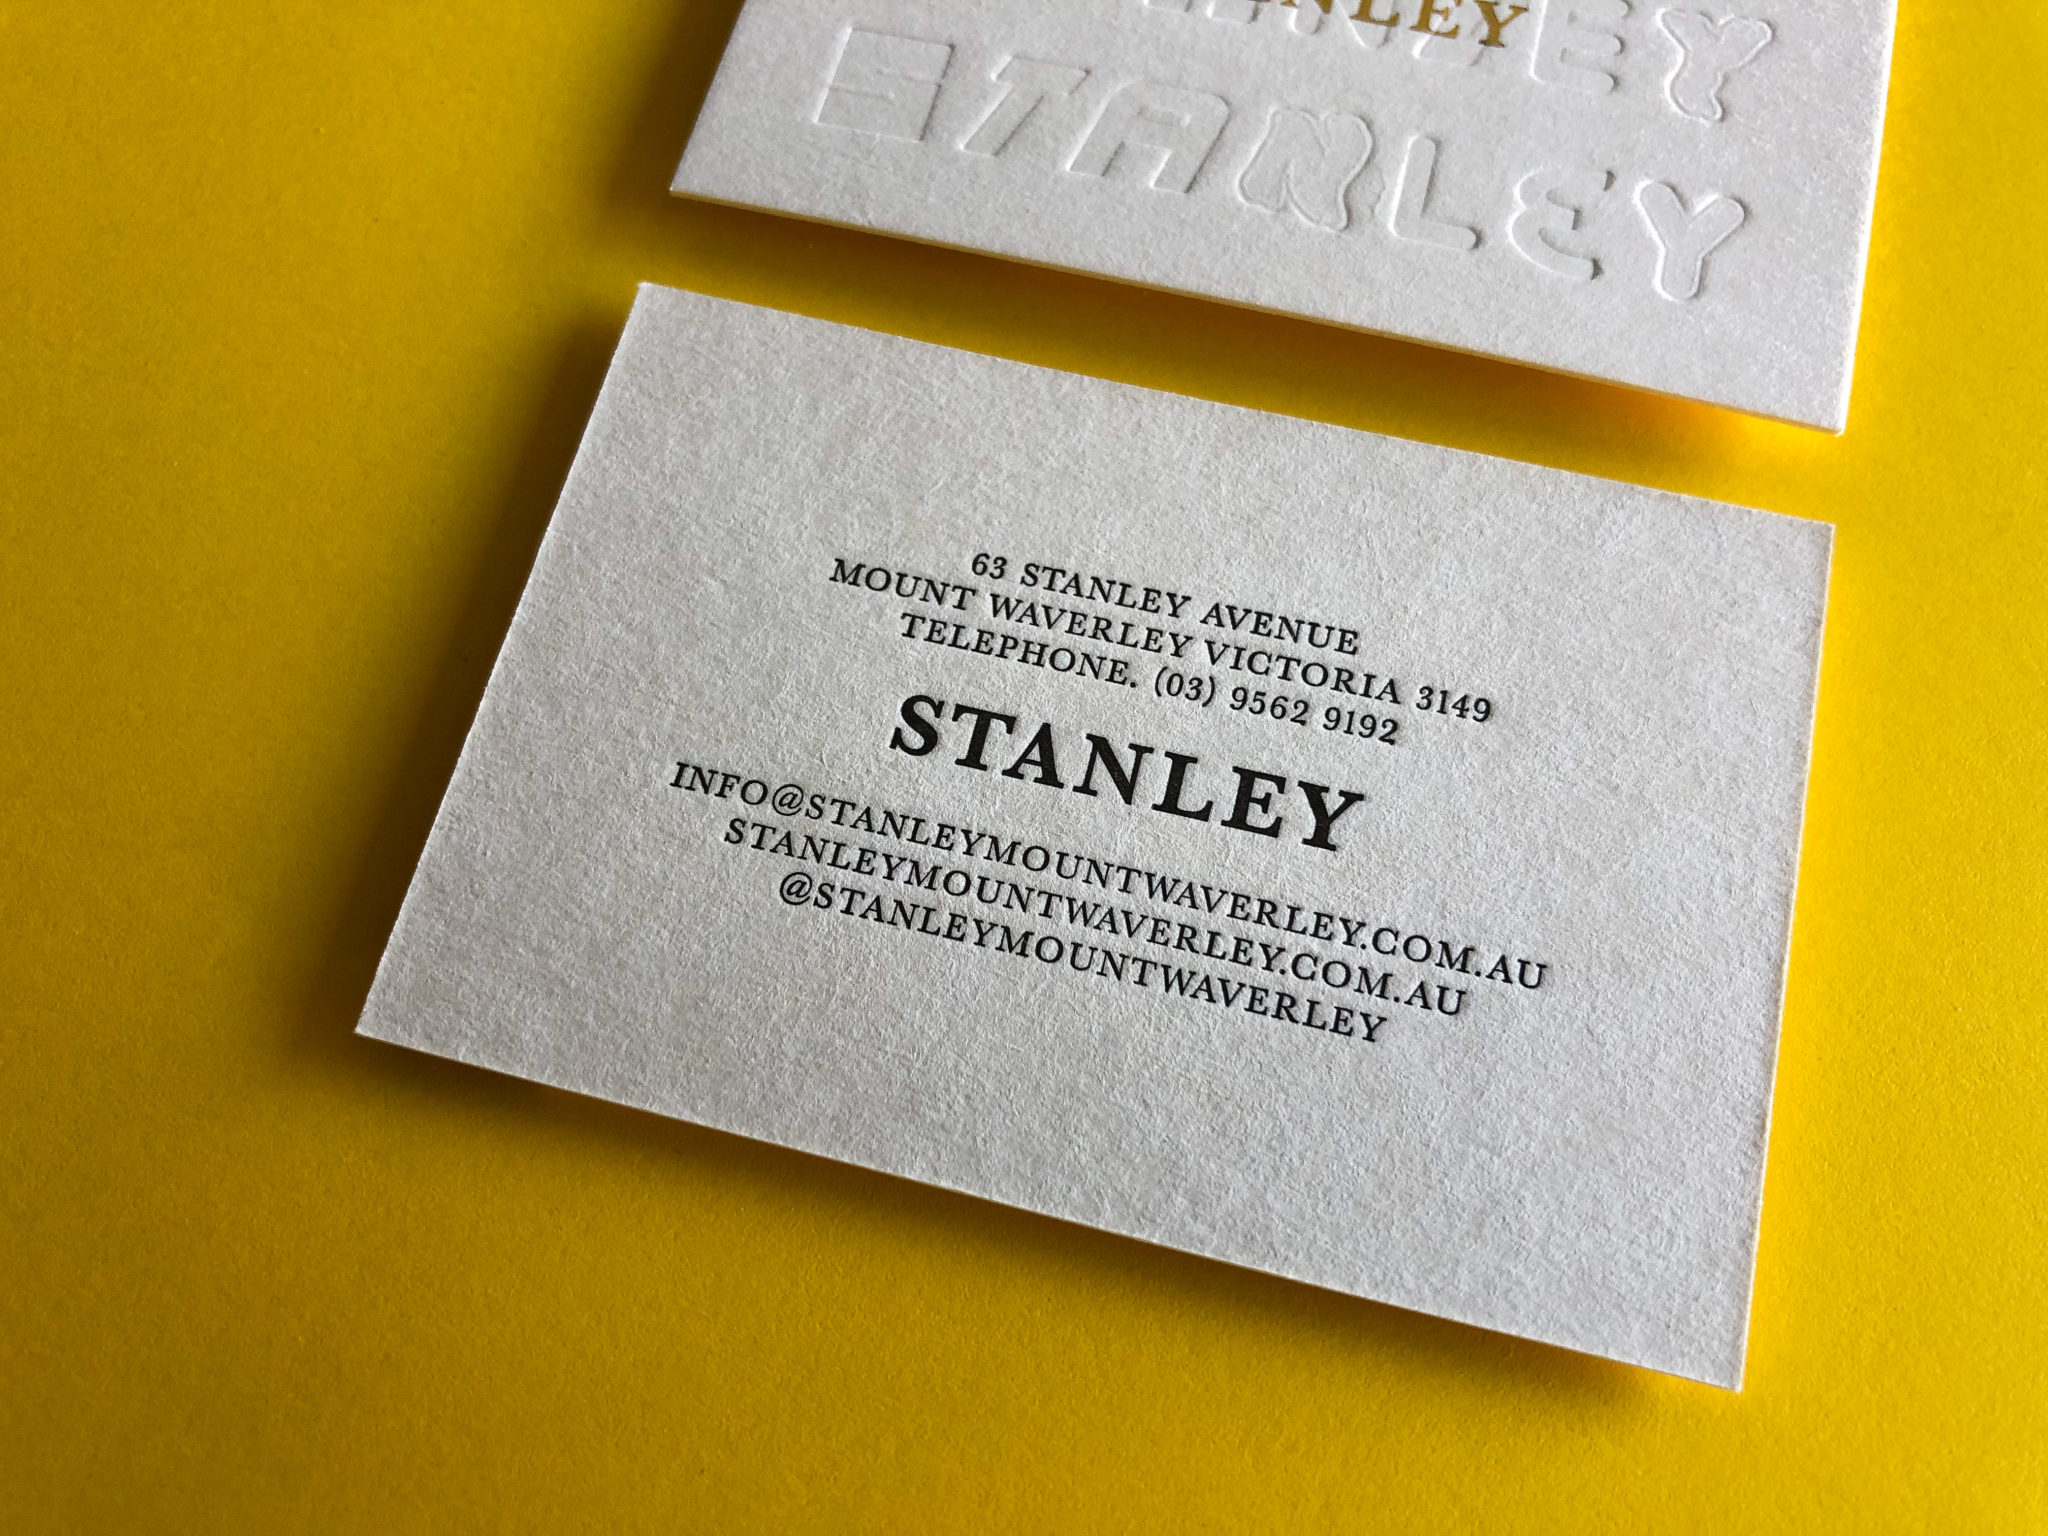 Gold Foil and Letterpress Business Cards for Stanley on Beer Matt Board 2